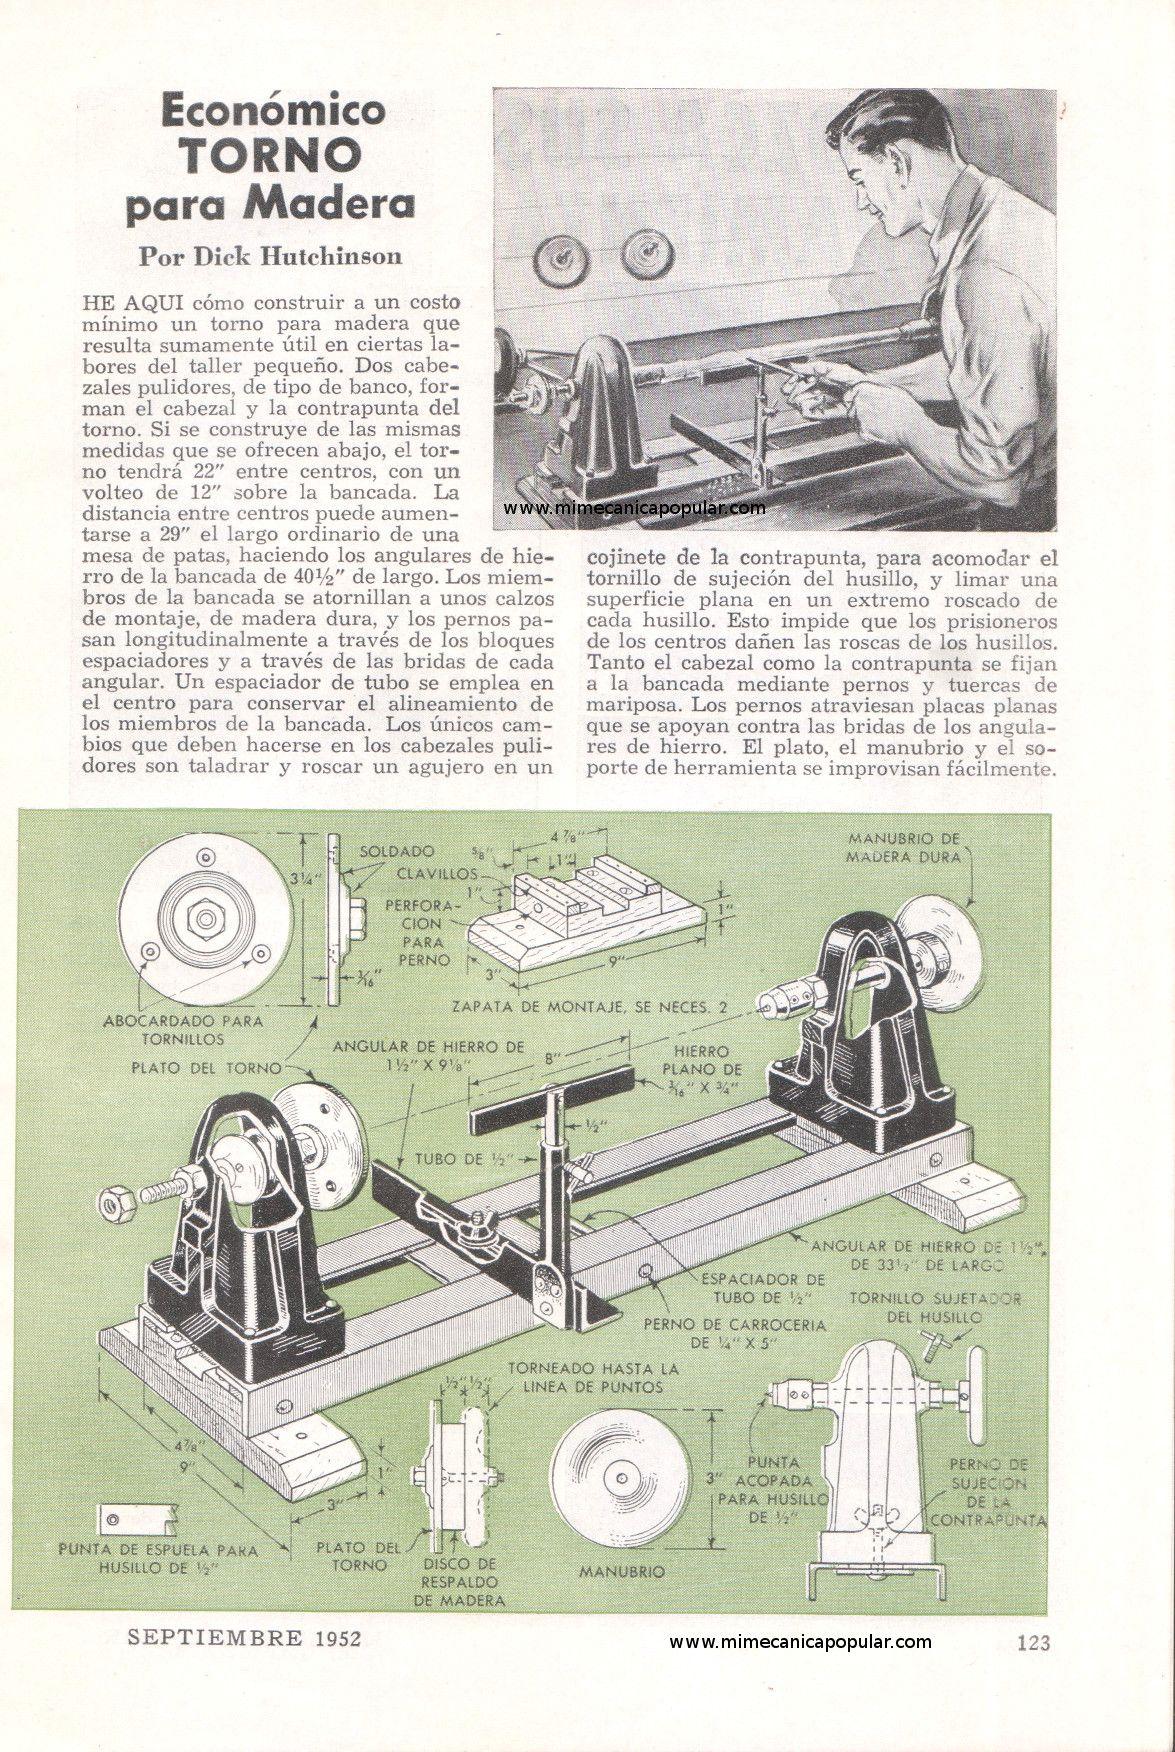 Mi mec nica popular imgcientocuarenta2 economico torno for Muebles de cocina modernos trackid sp 006